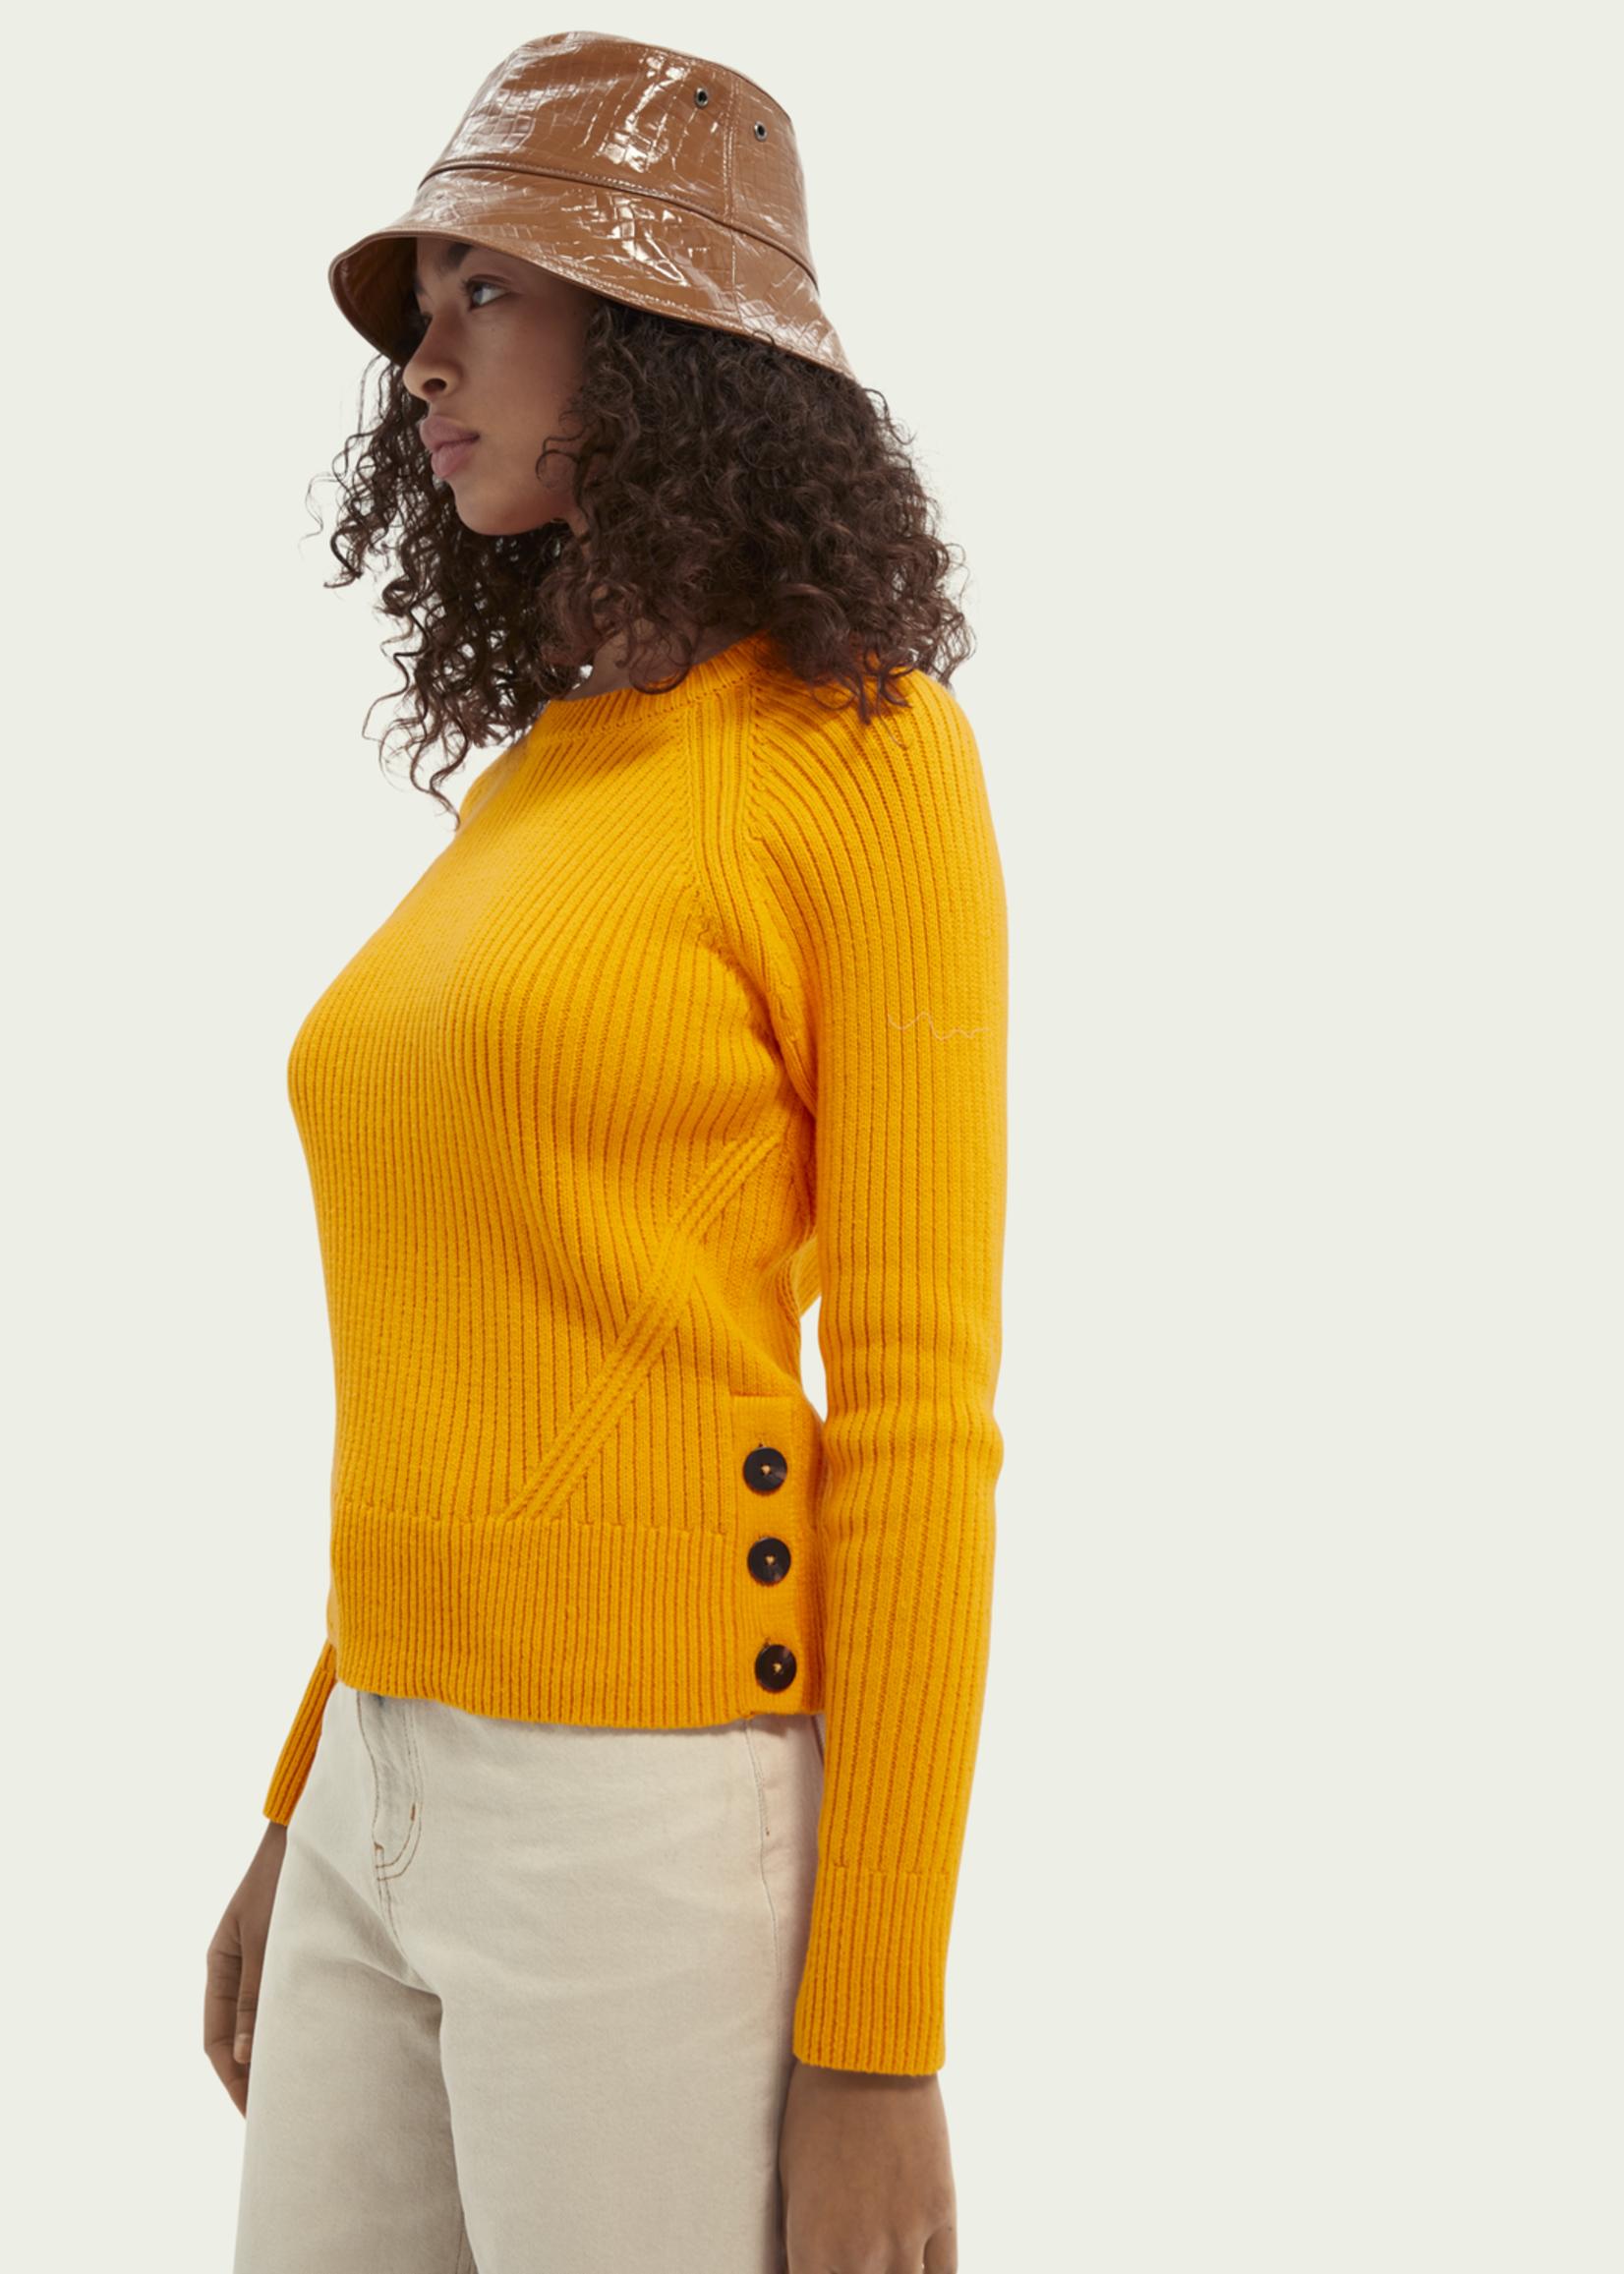 Scotch & Soda Scotch & Soda Ribbed Knit Organic Cotton-Blend Sweater